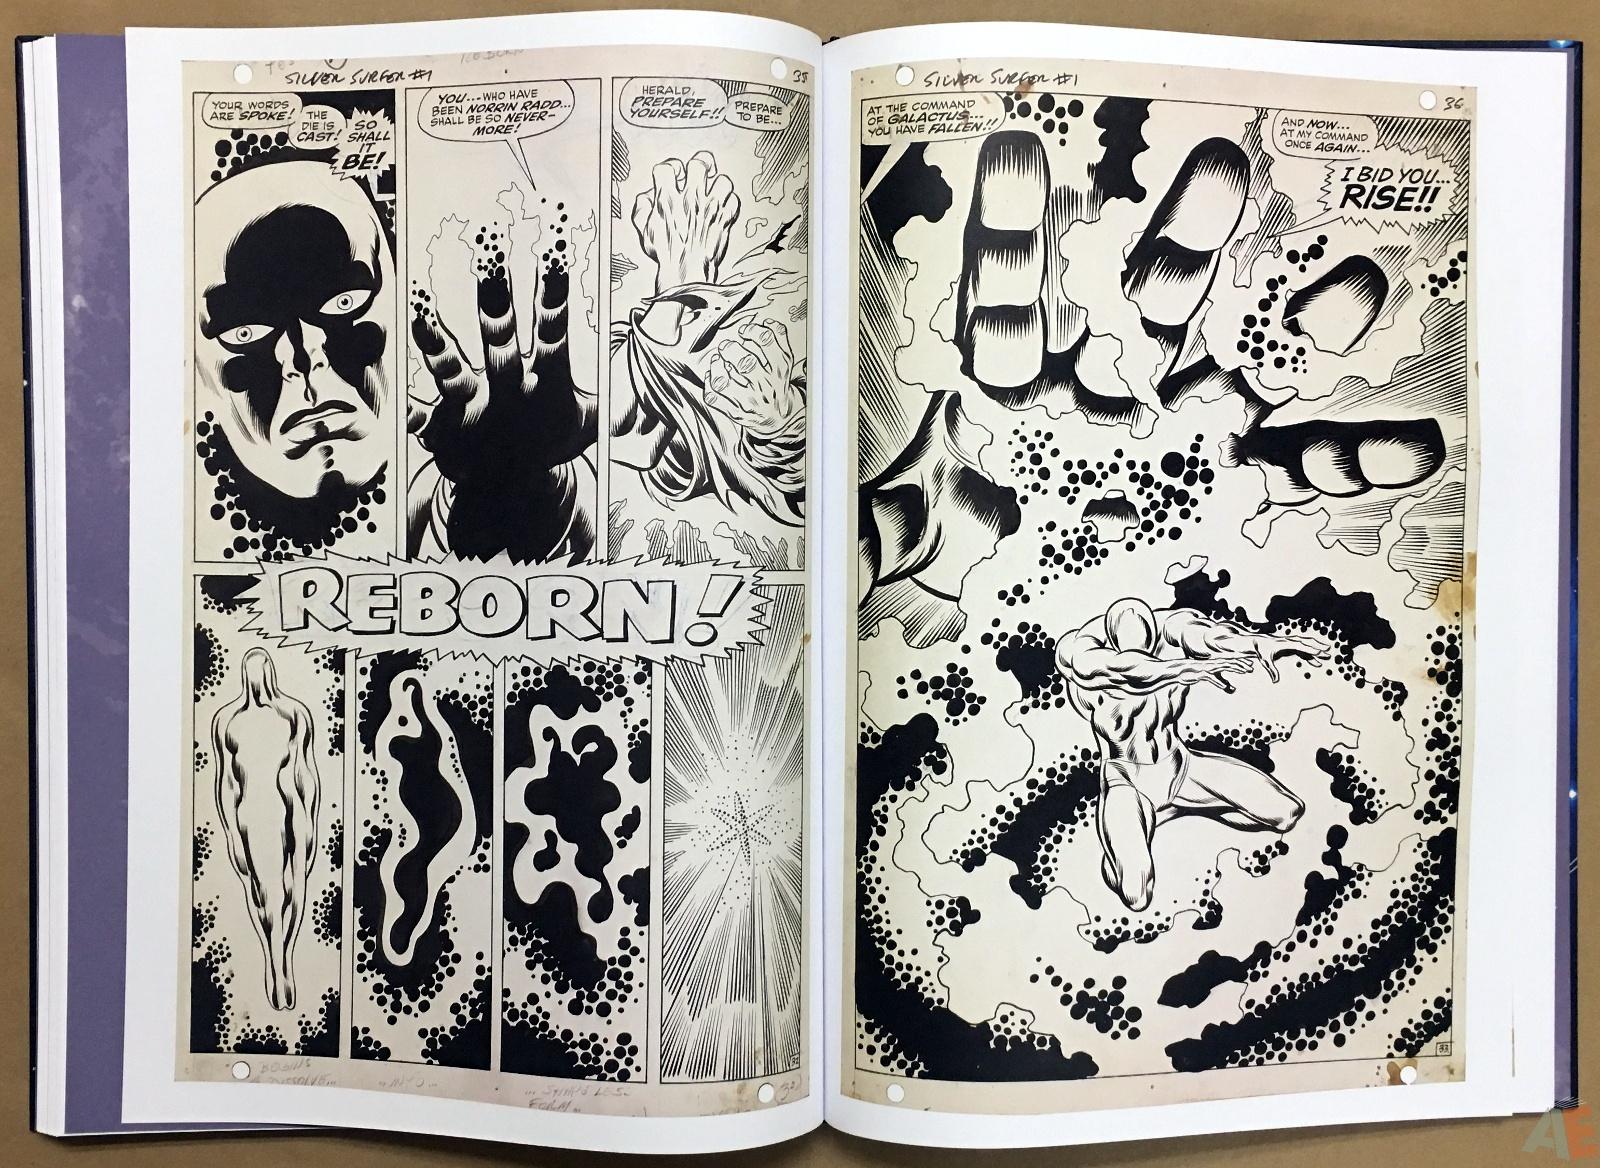 John Buscema's Silver Surfer Artist's Edition 34